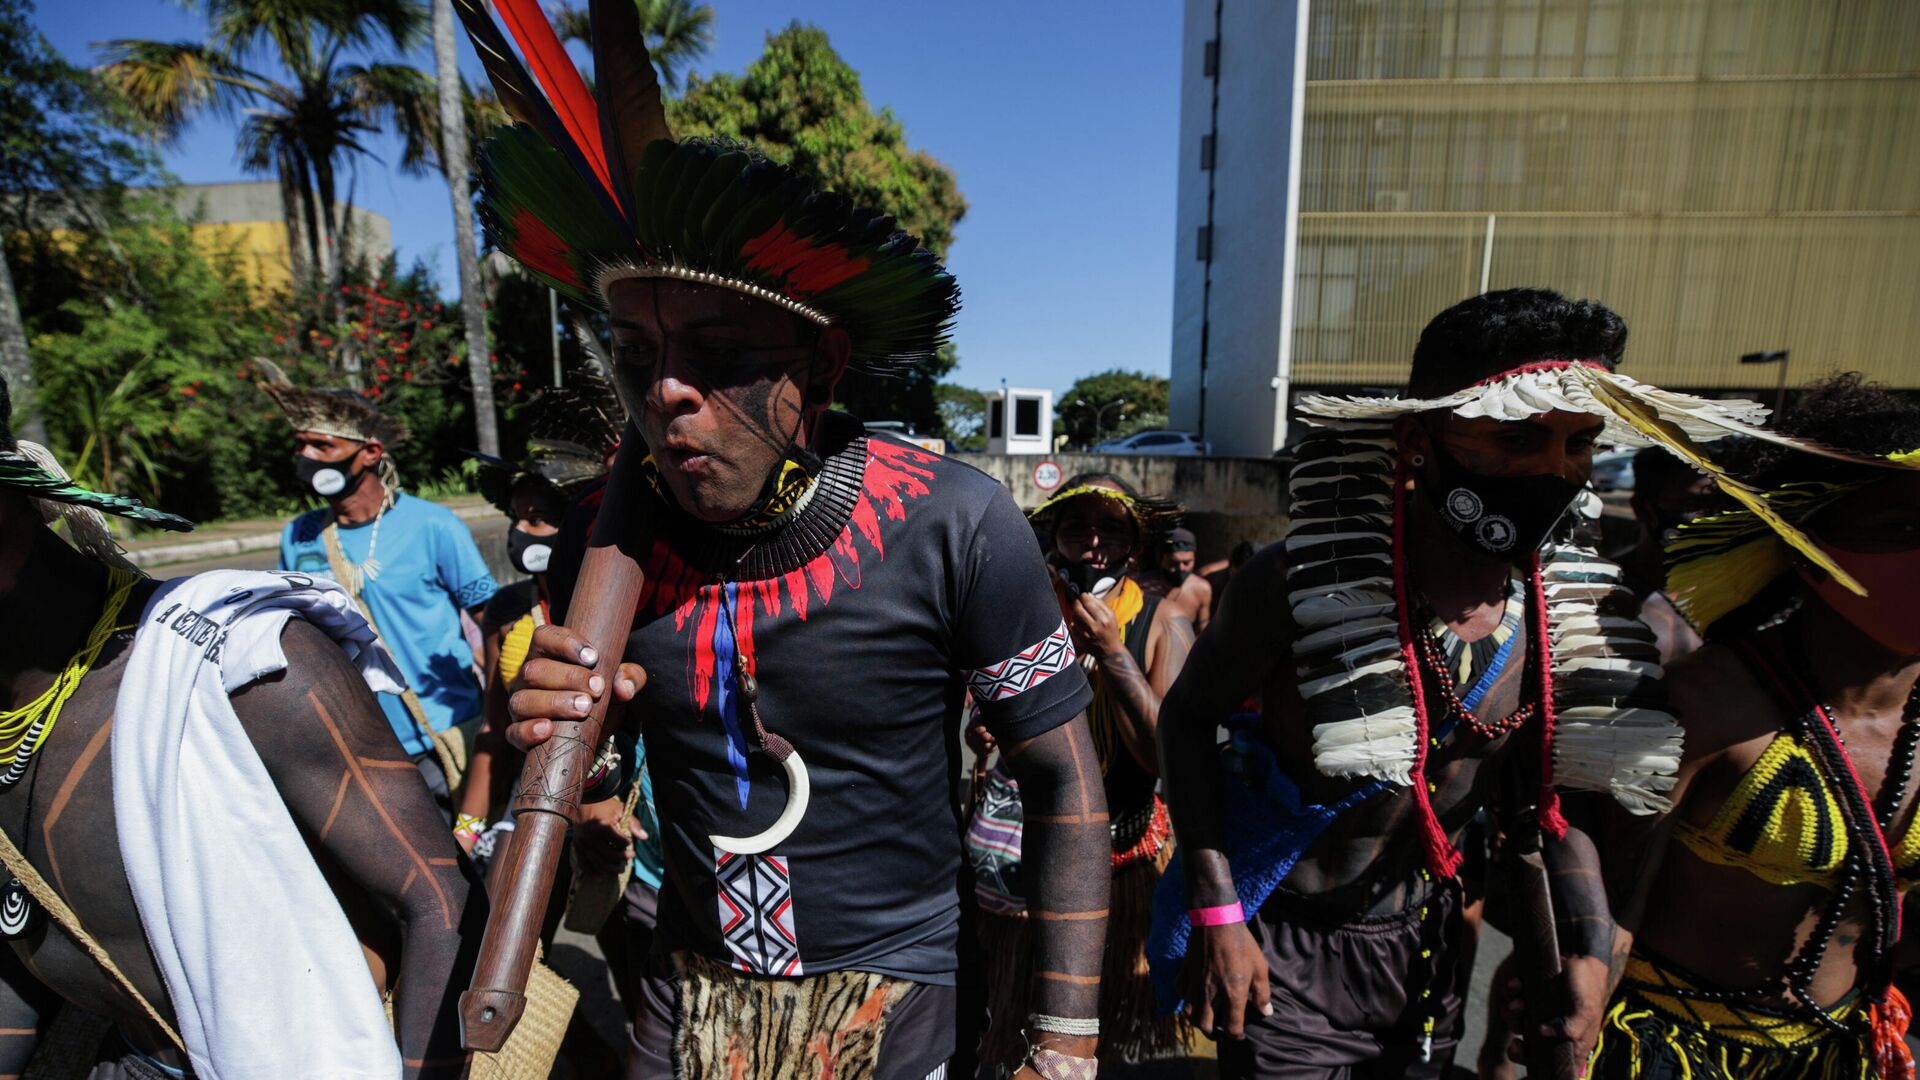 Indígenas brasileños protestan en Brasilia contra Bolsonaro - Sputnik Mundo, 1920, 22.06.2021